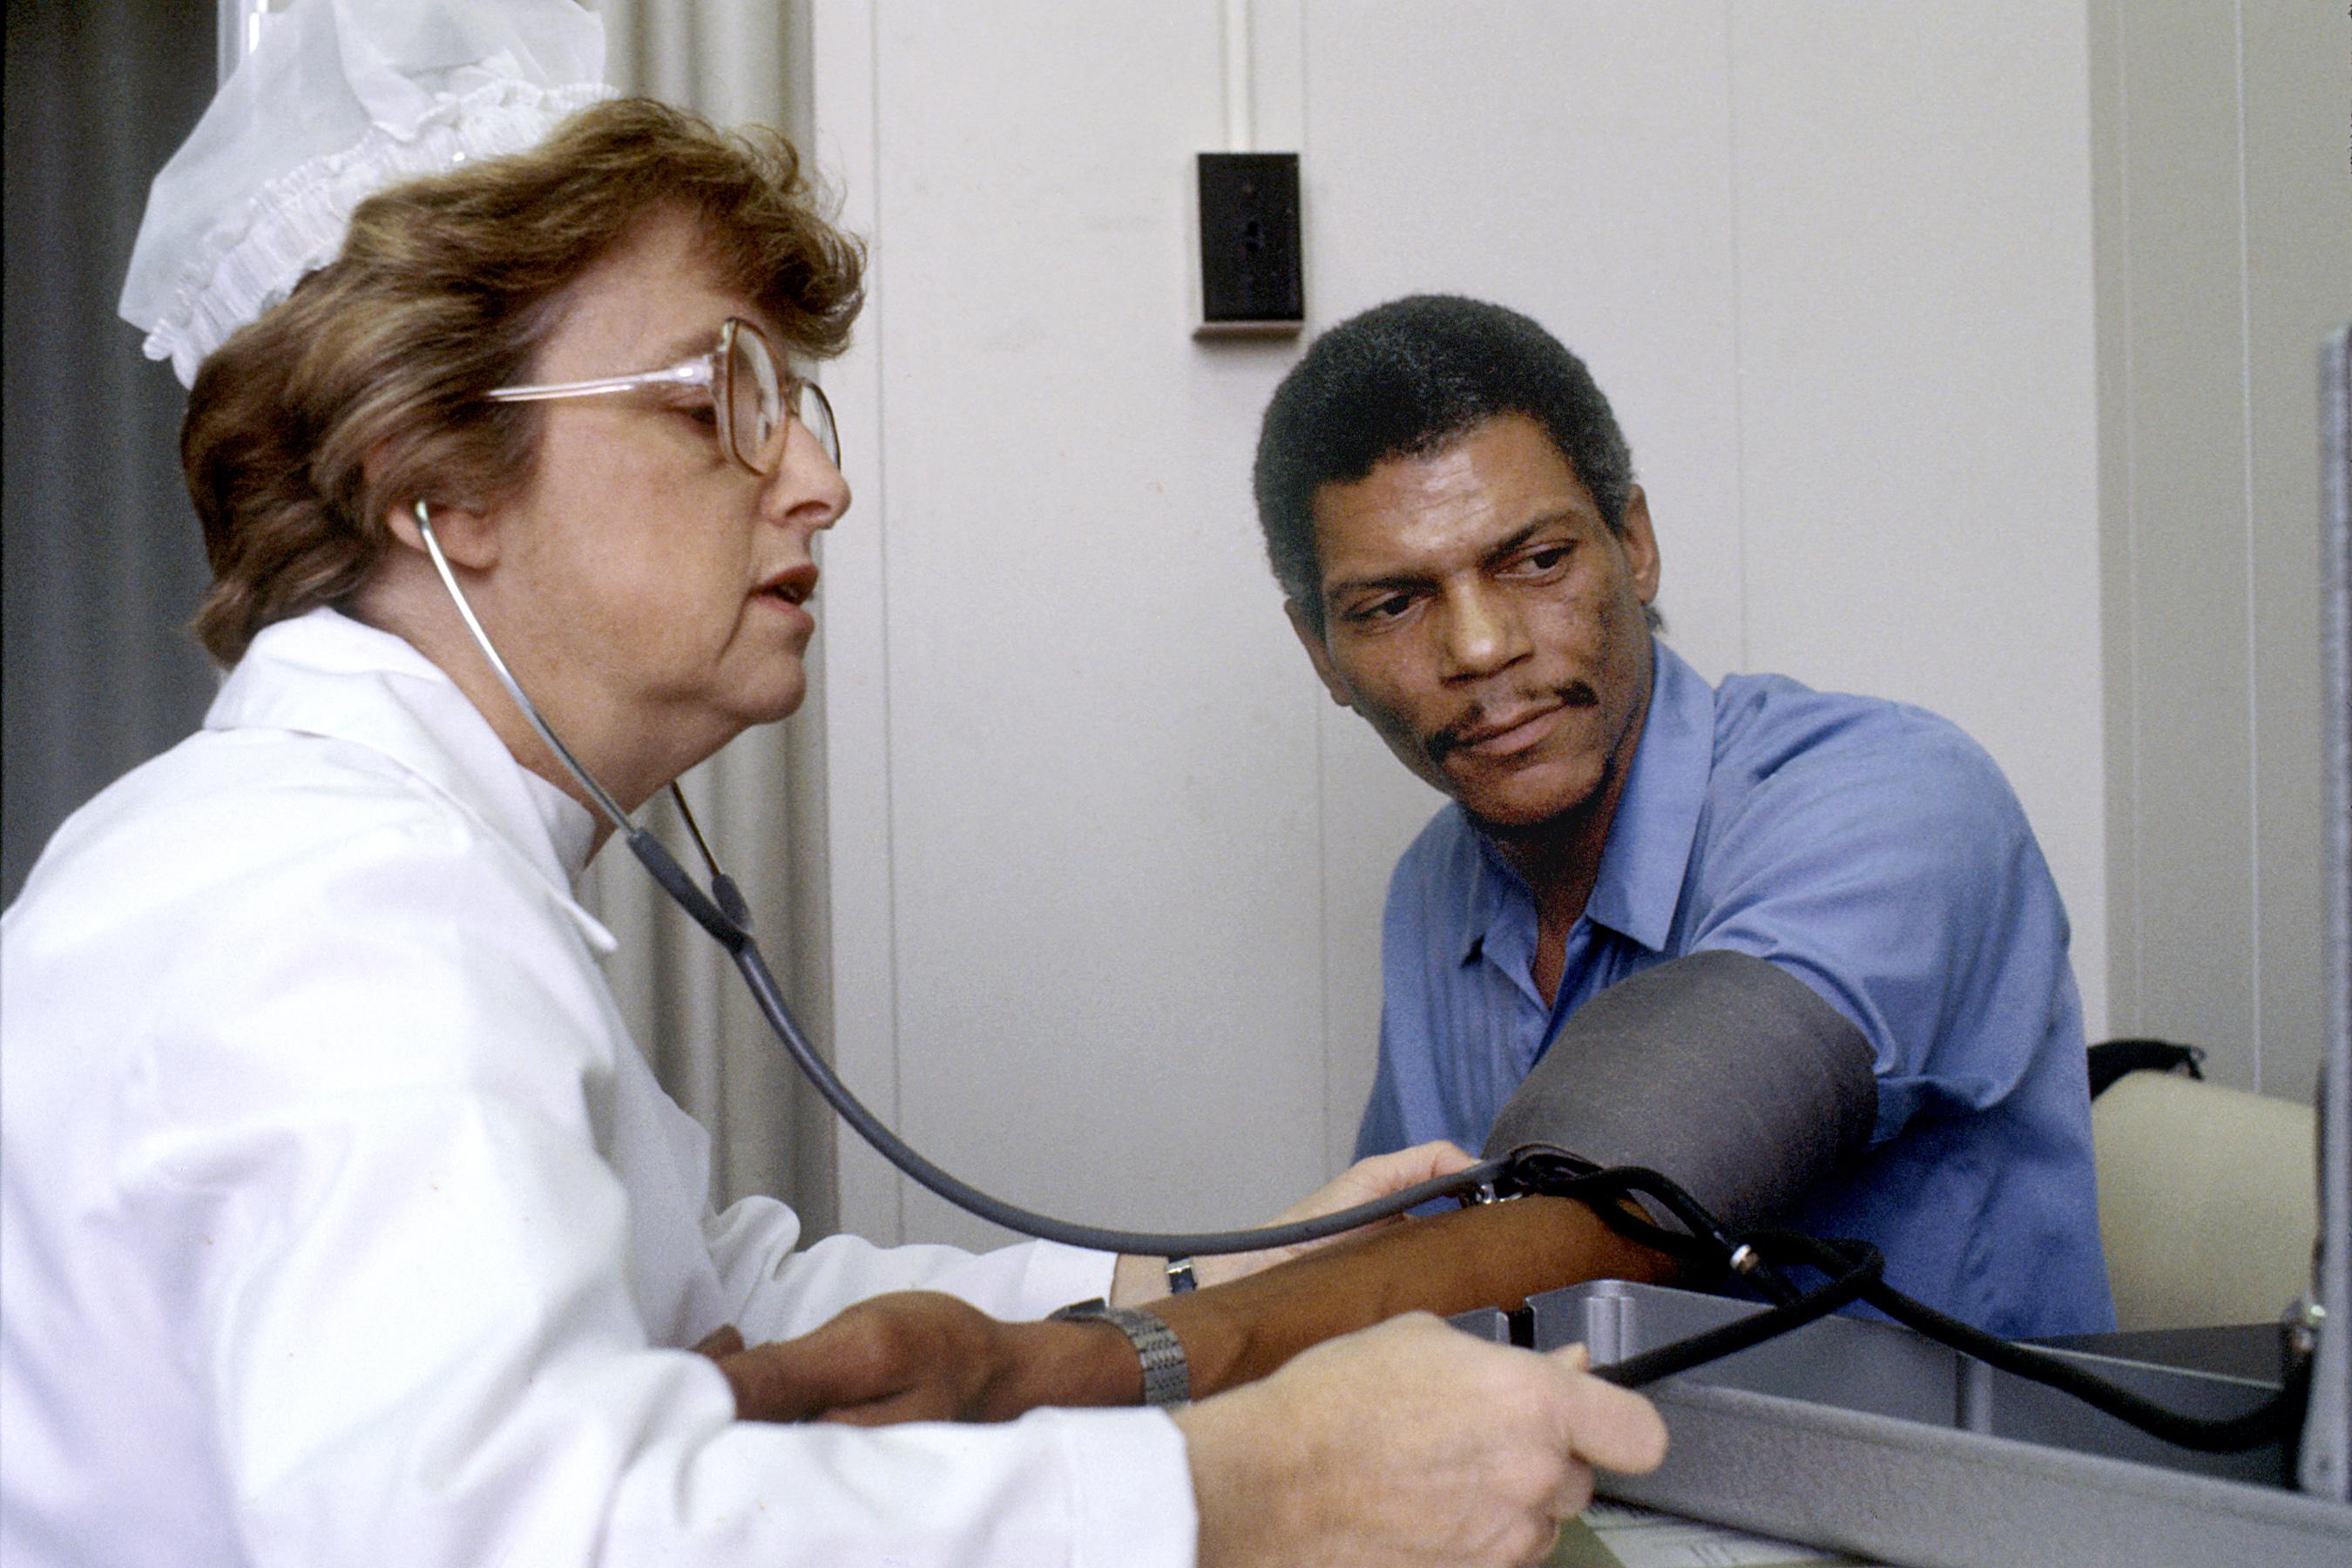 Home Health Nurse Responsibilities